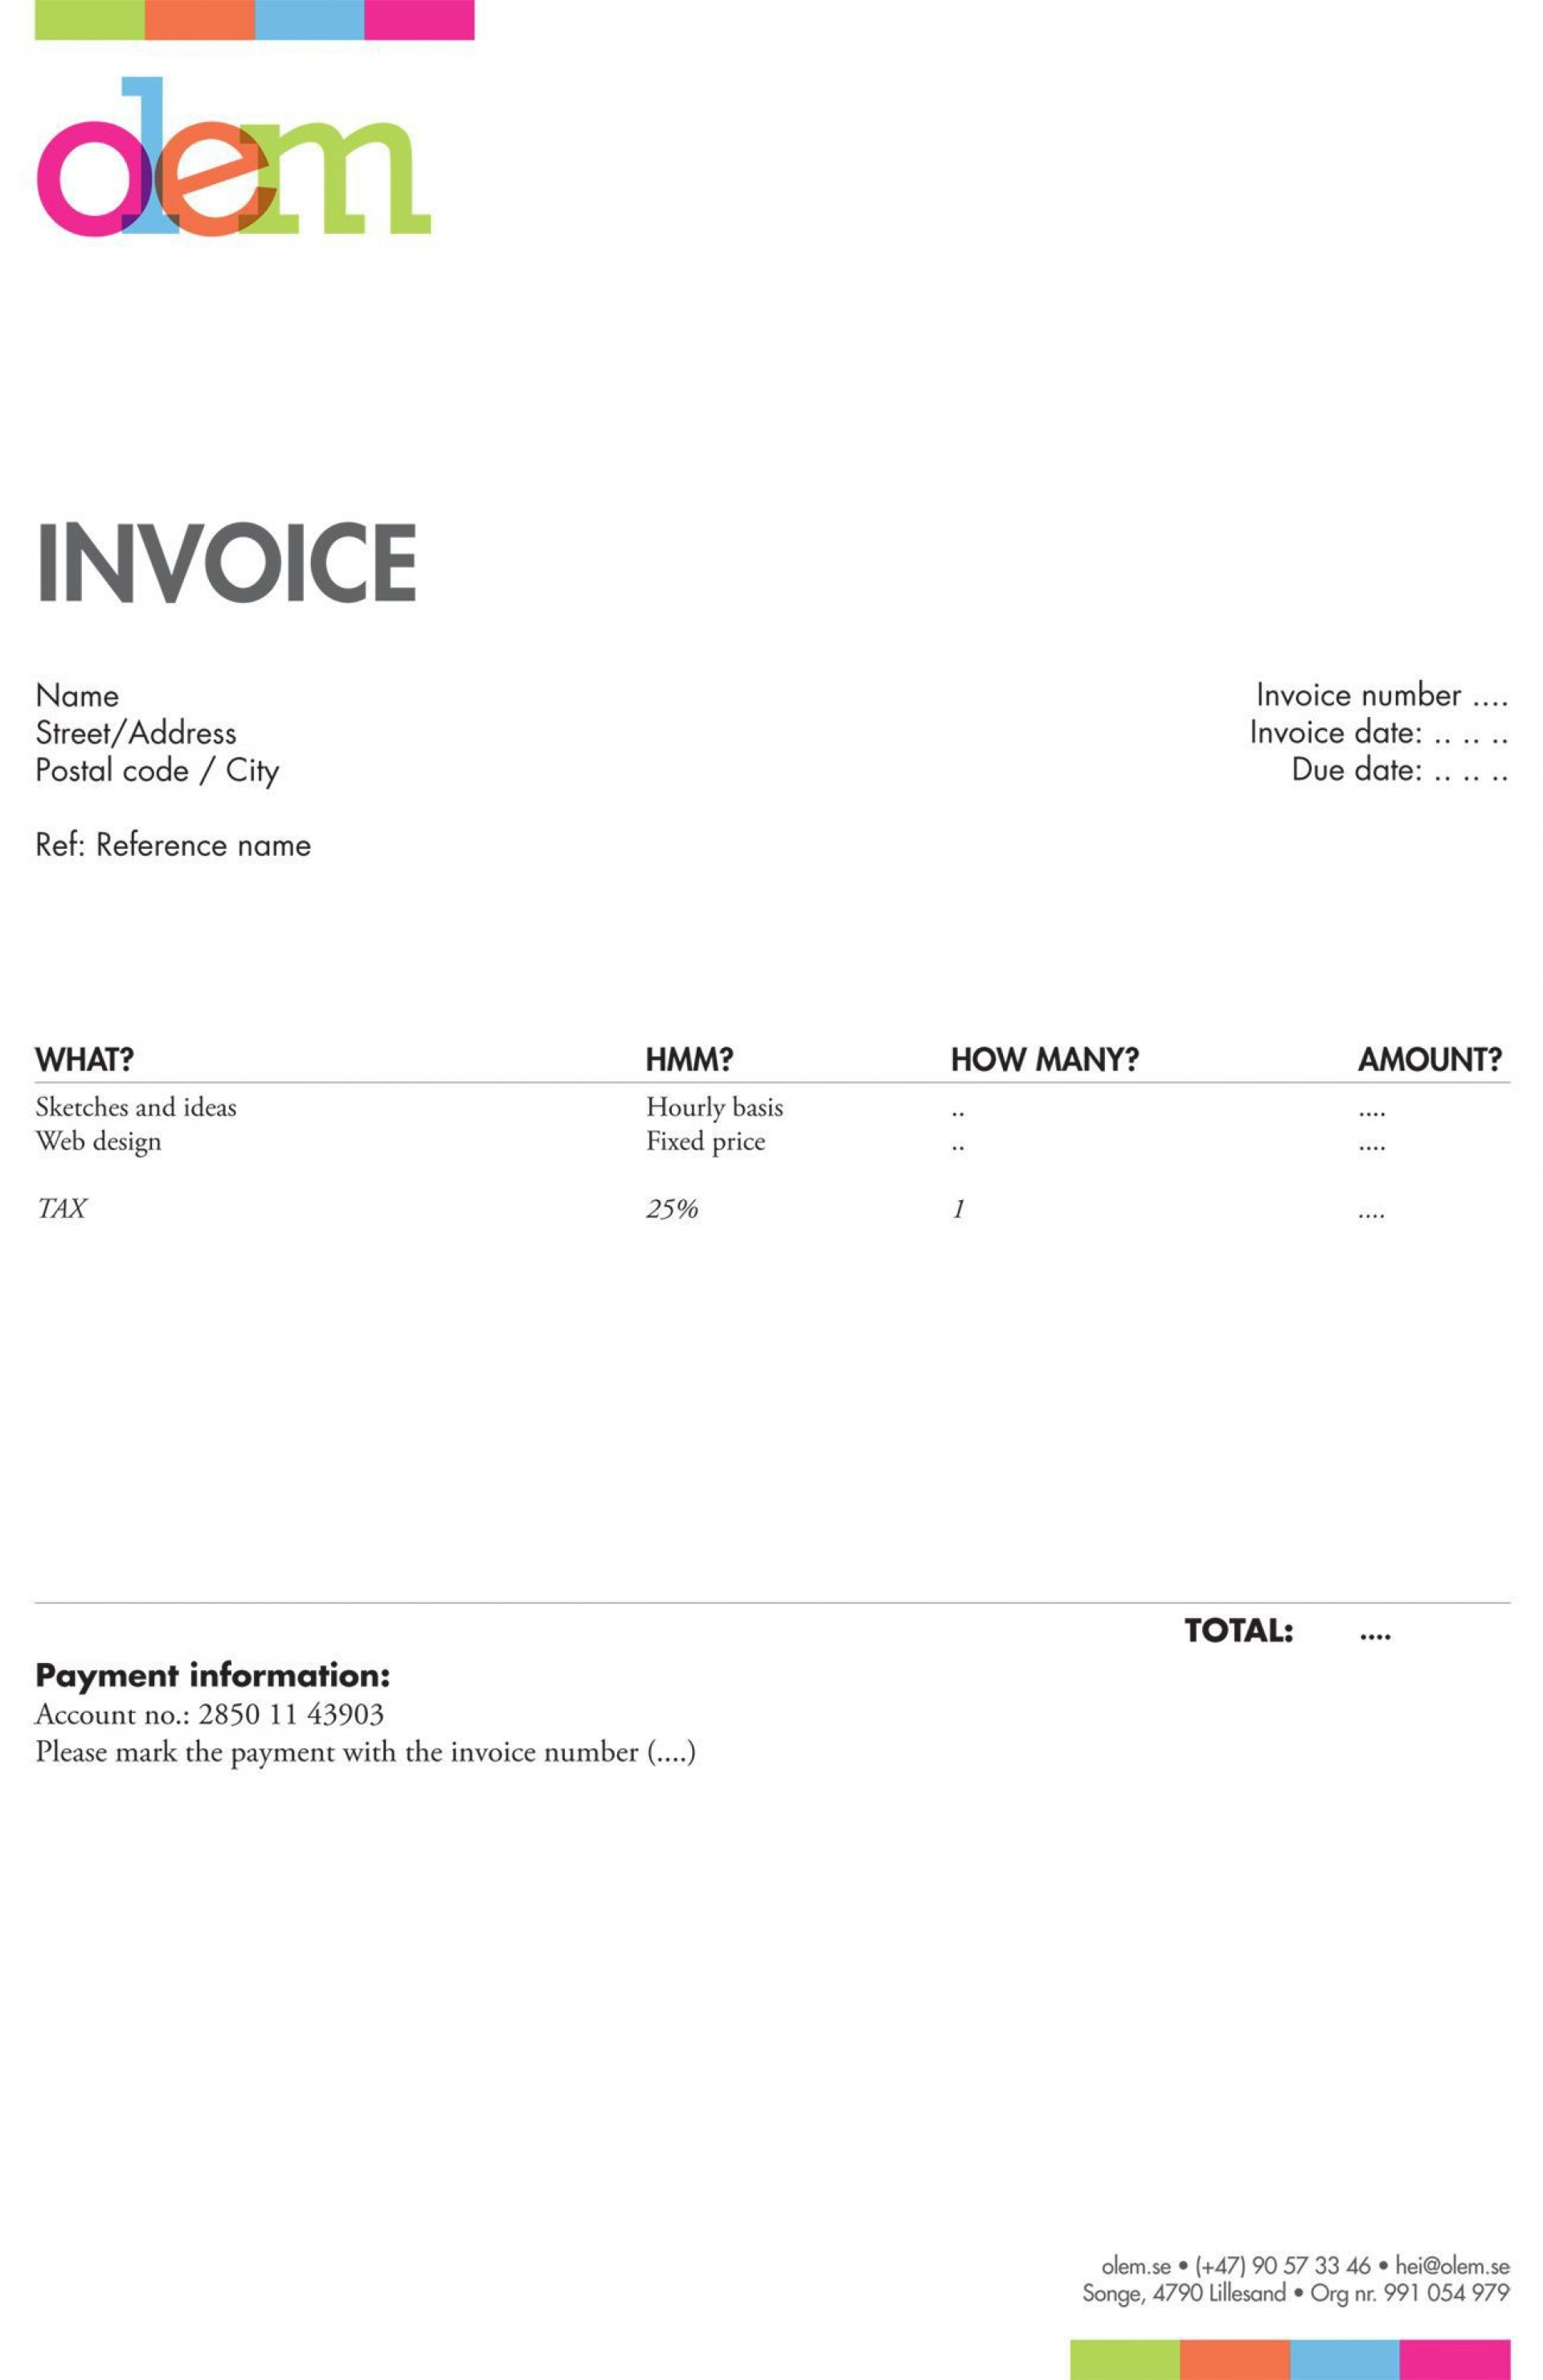 005 Top Freelance Designer Invoice Template Inspiration  Web Creative Uk1920